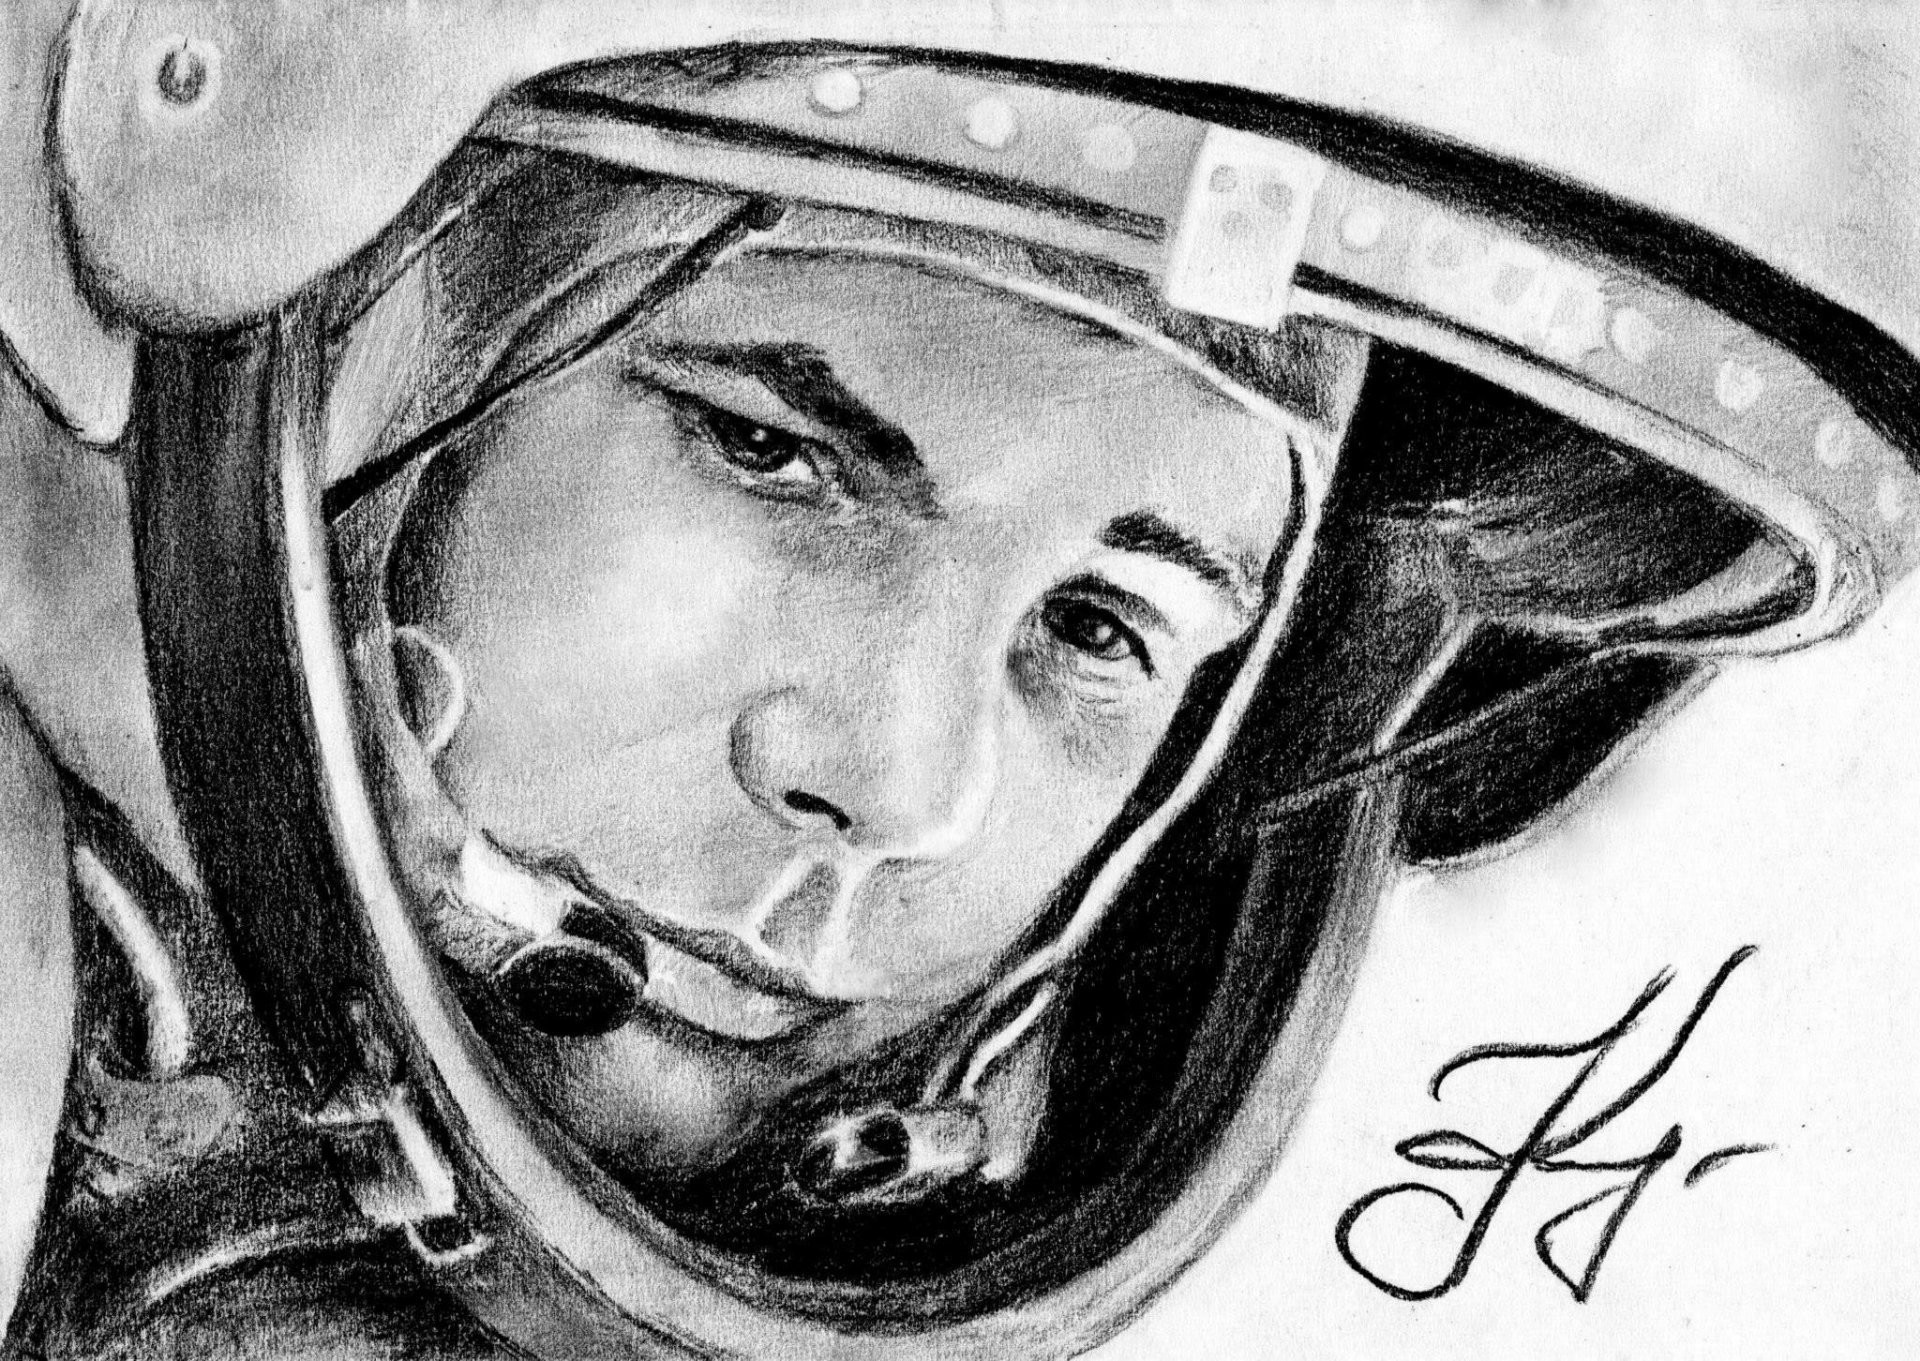 yuri gagarin cosmonaut legend hero suit picture